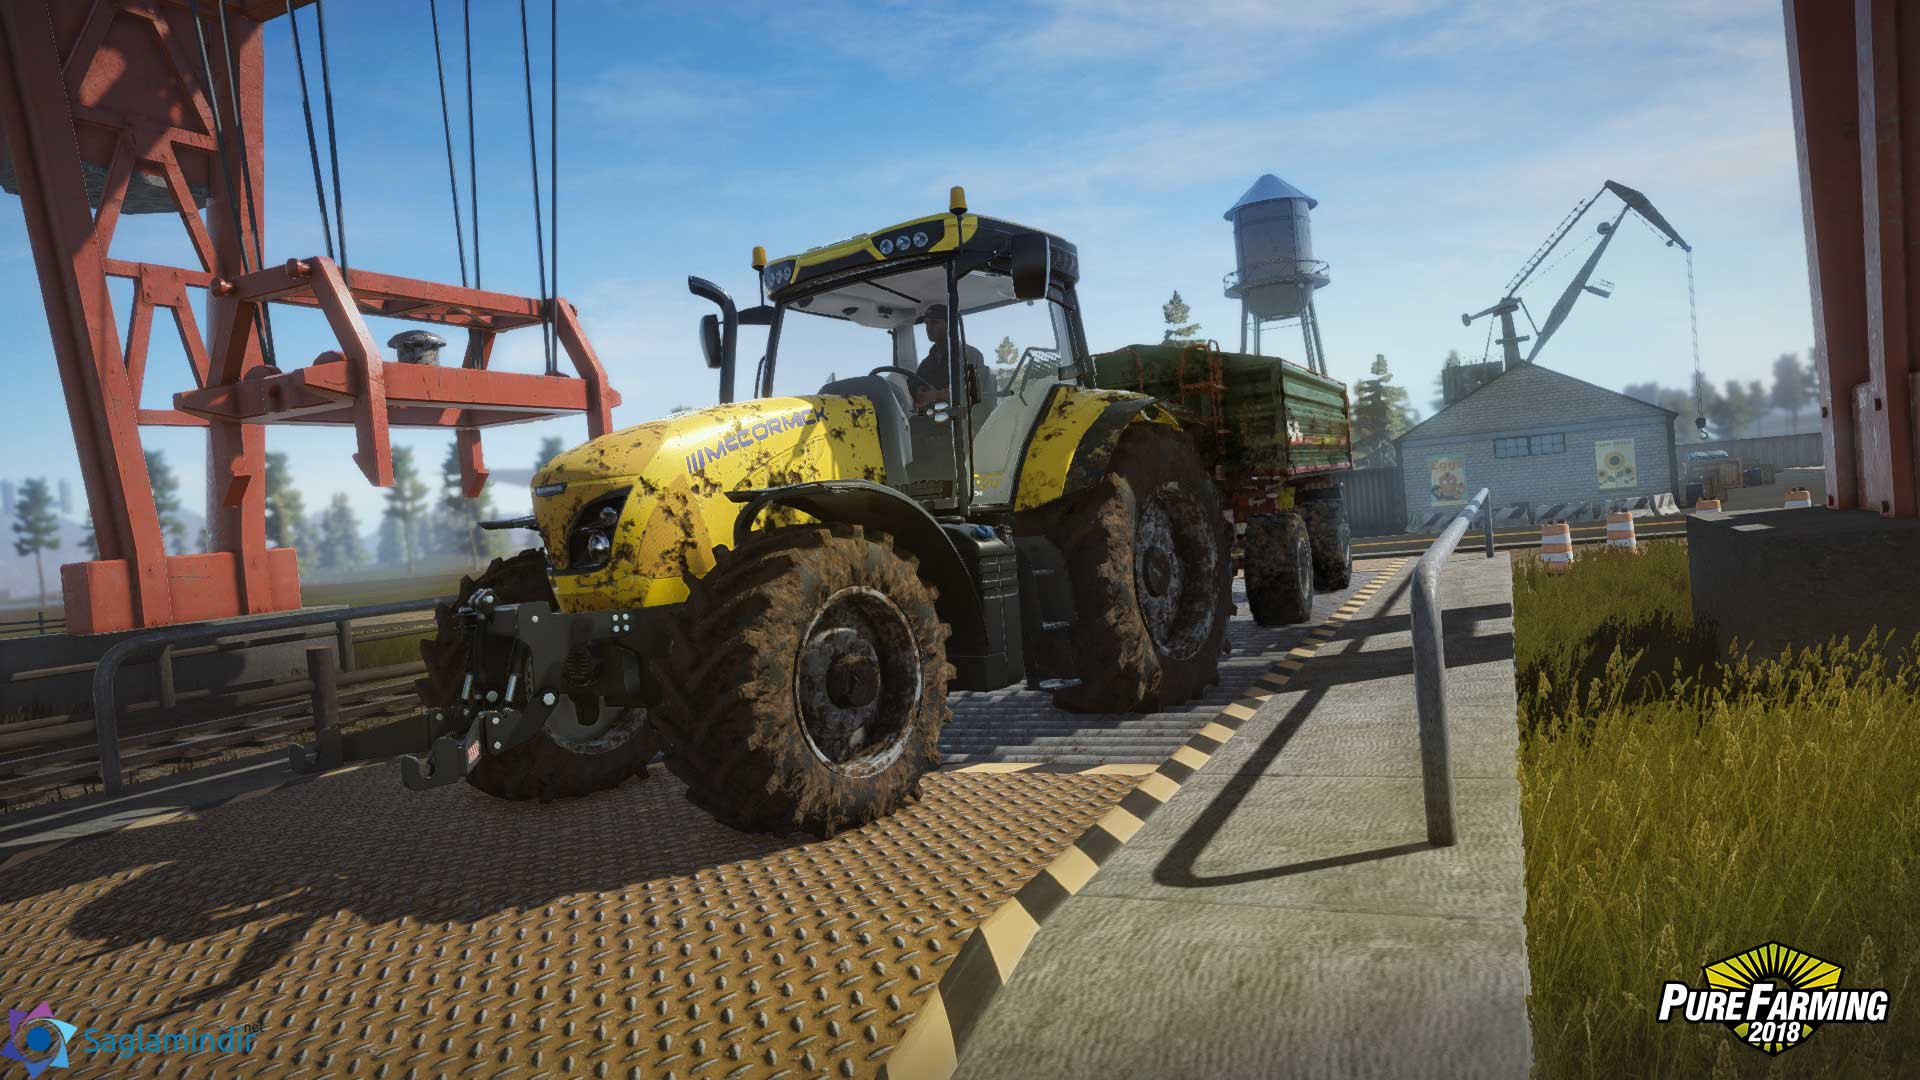 Pure Farming 2018 saglamindir